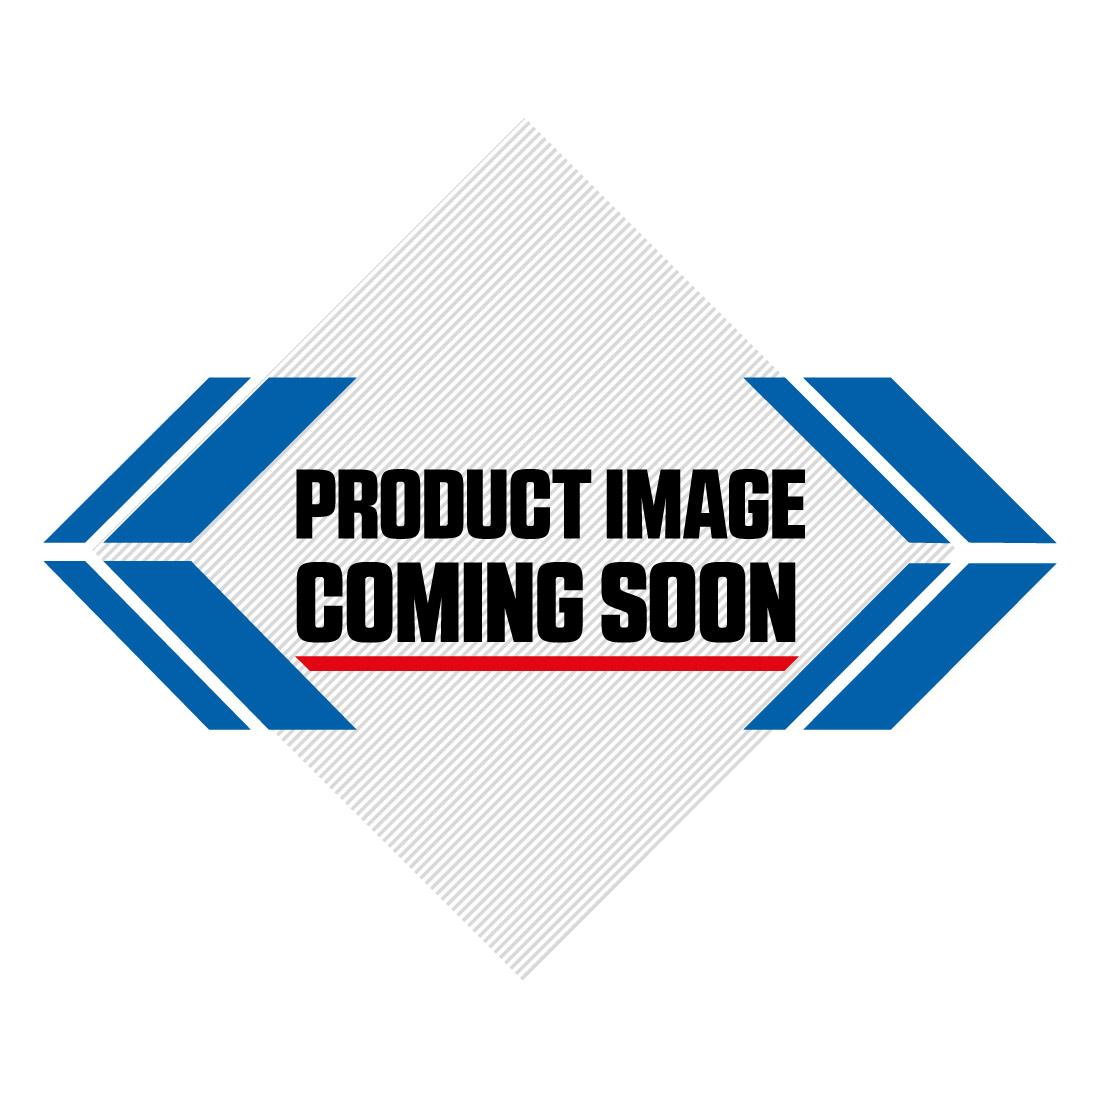 DJI Mavic Pro Platinum Drone Image-1>